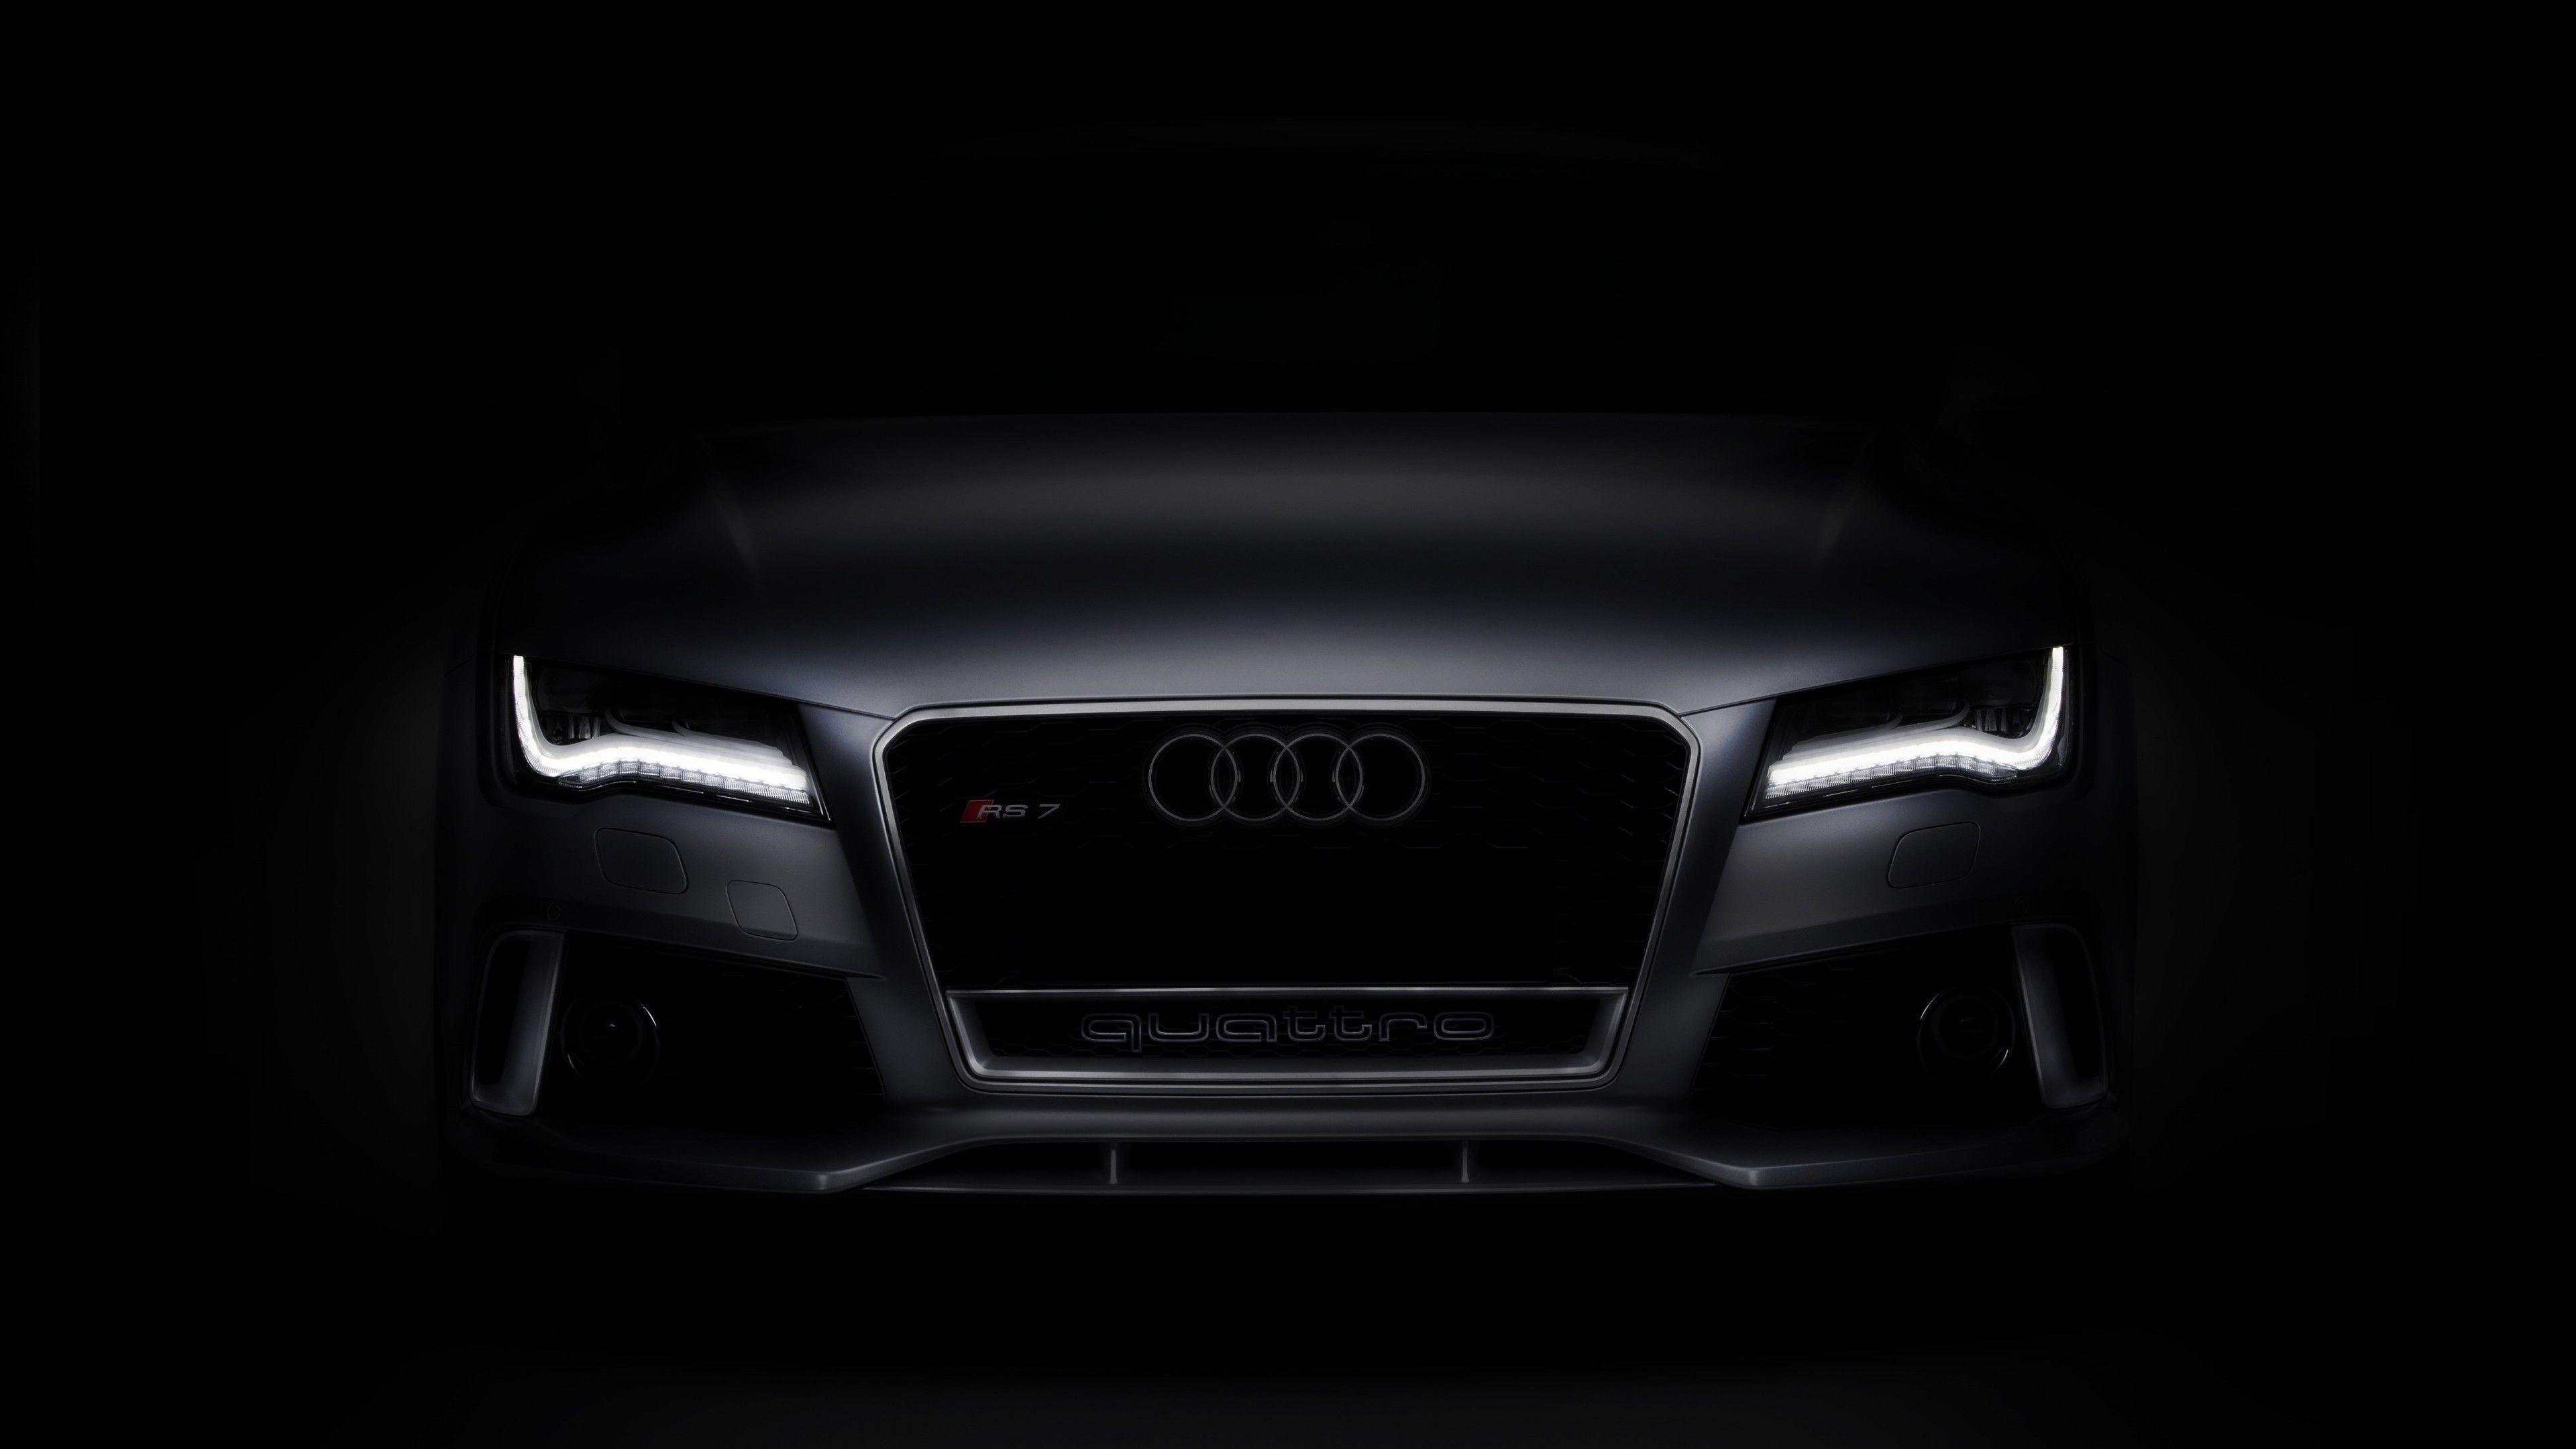 Audi Rs7 4k Wallpaper Audi Rs7 Sportback Audi Rs7 Black Car